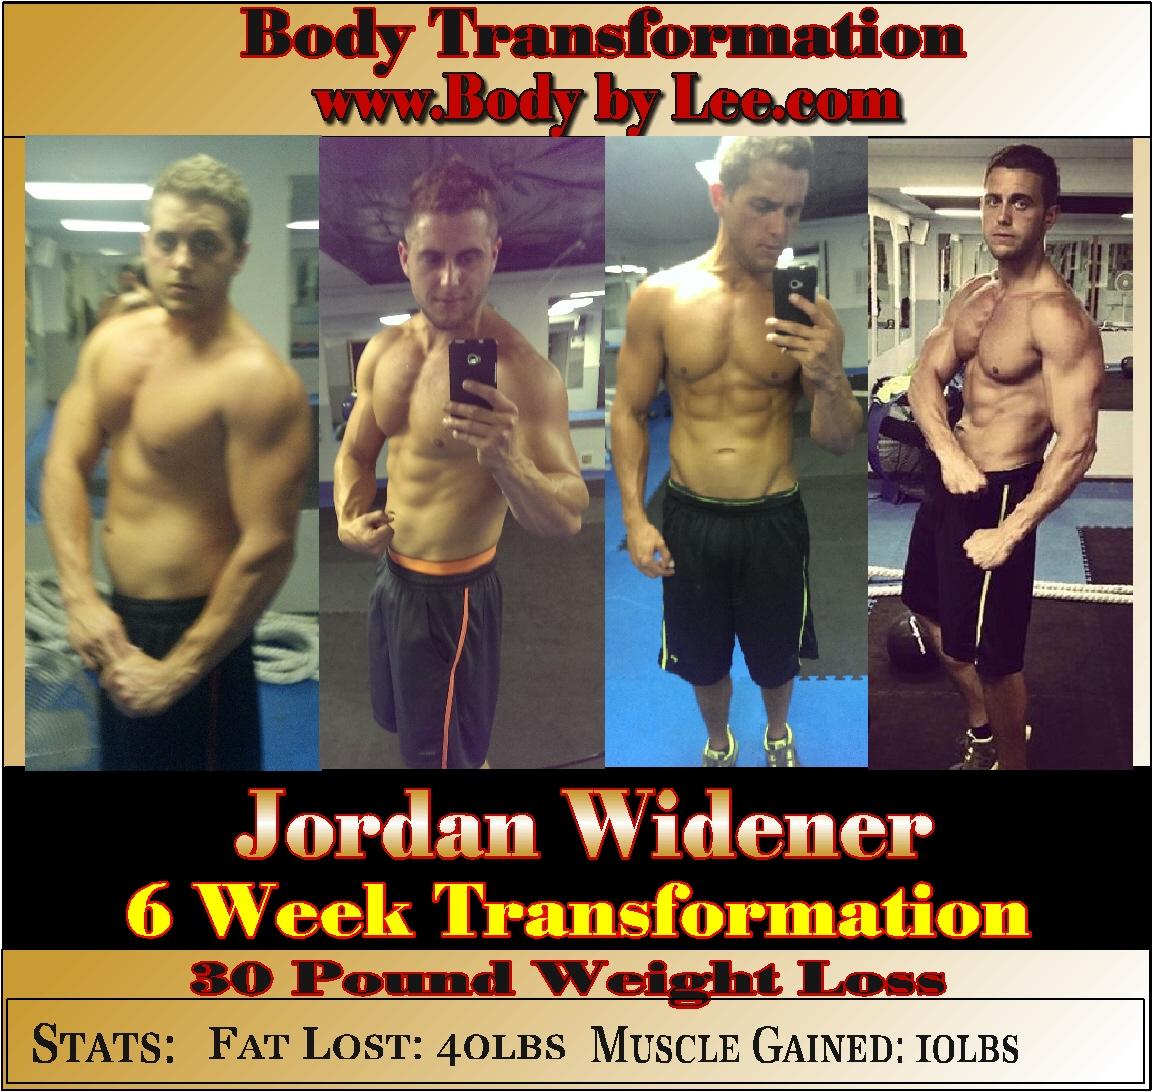 Jordan Widener